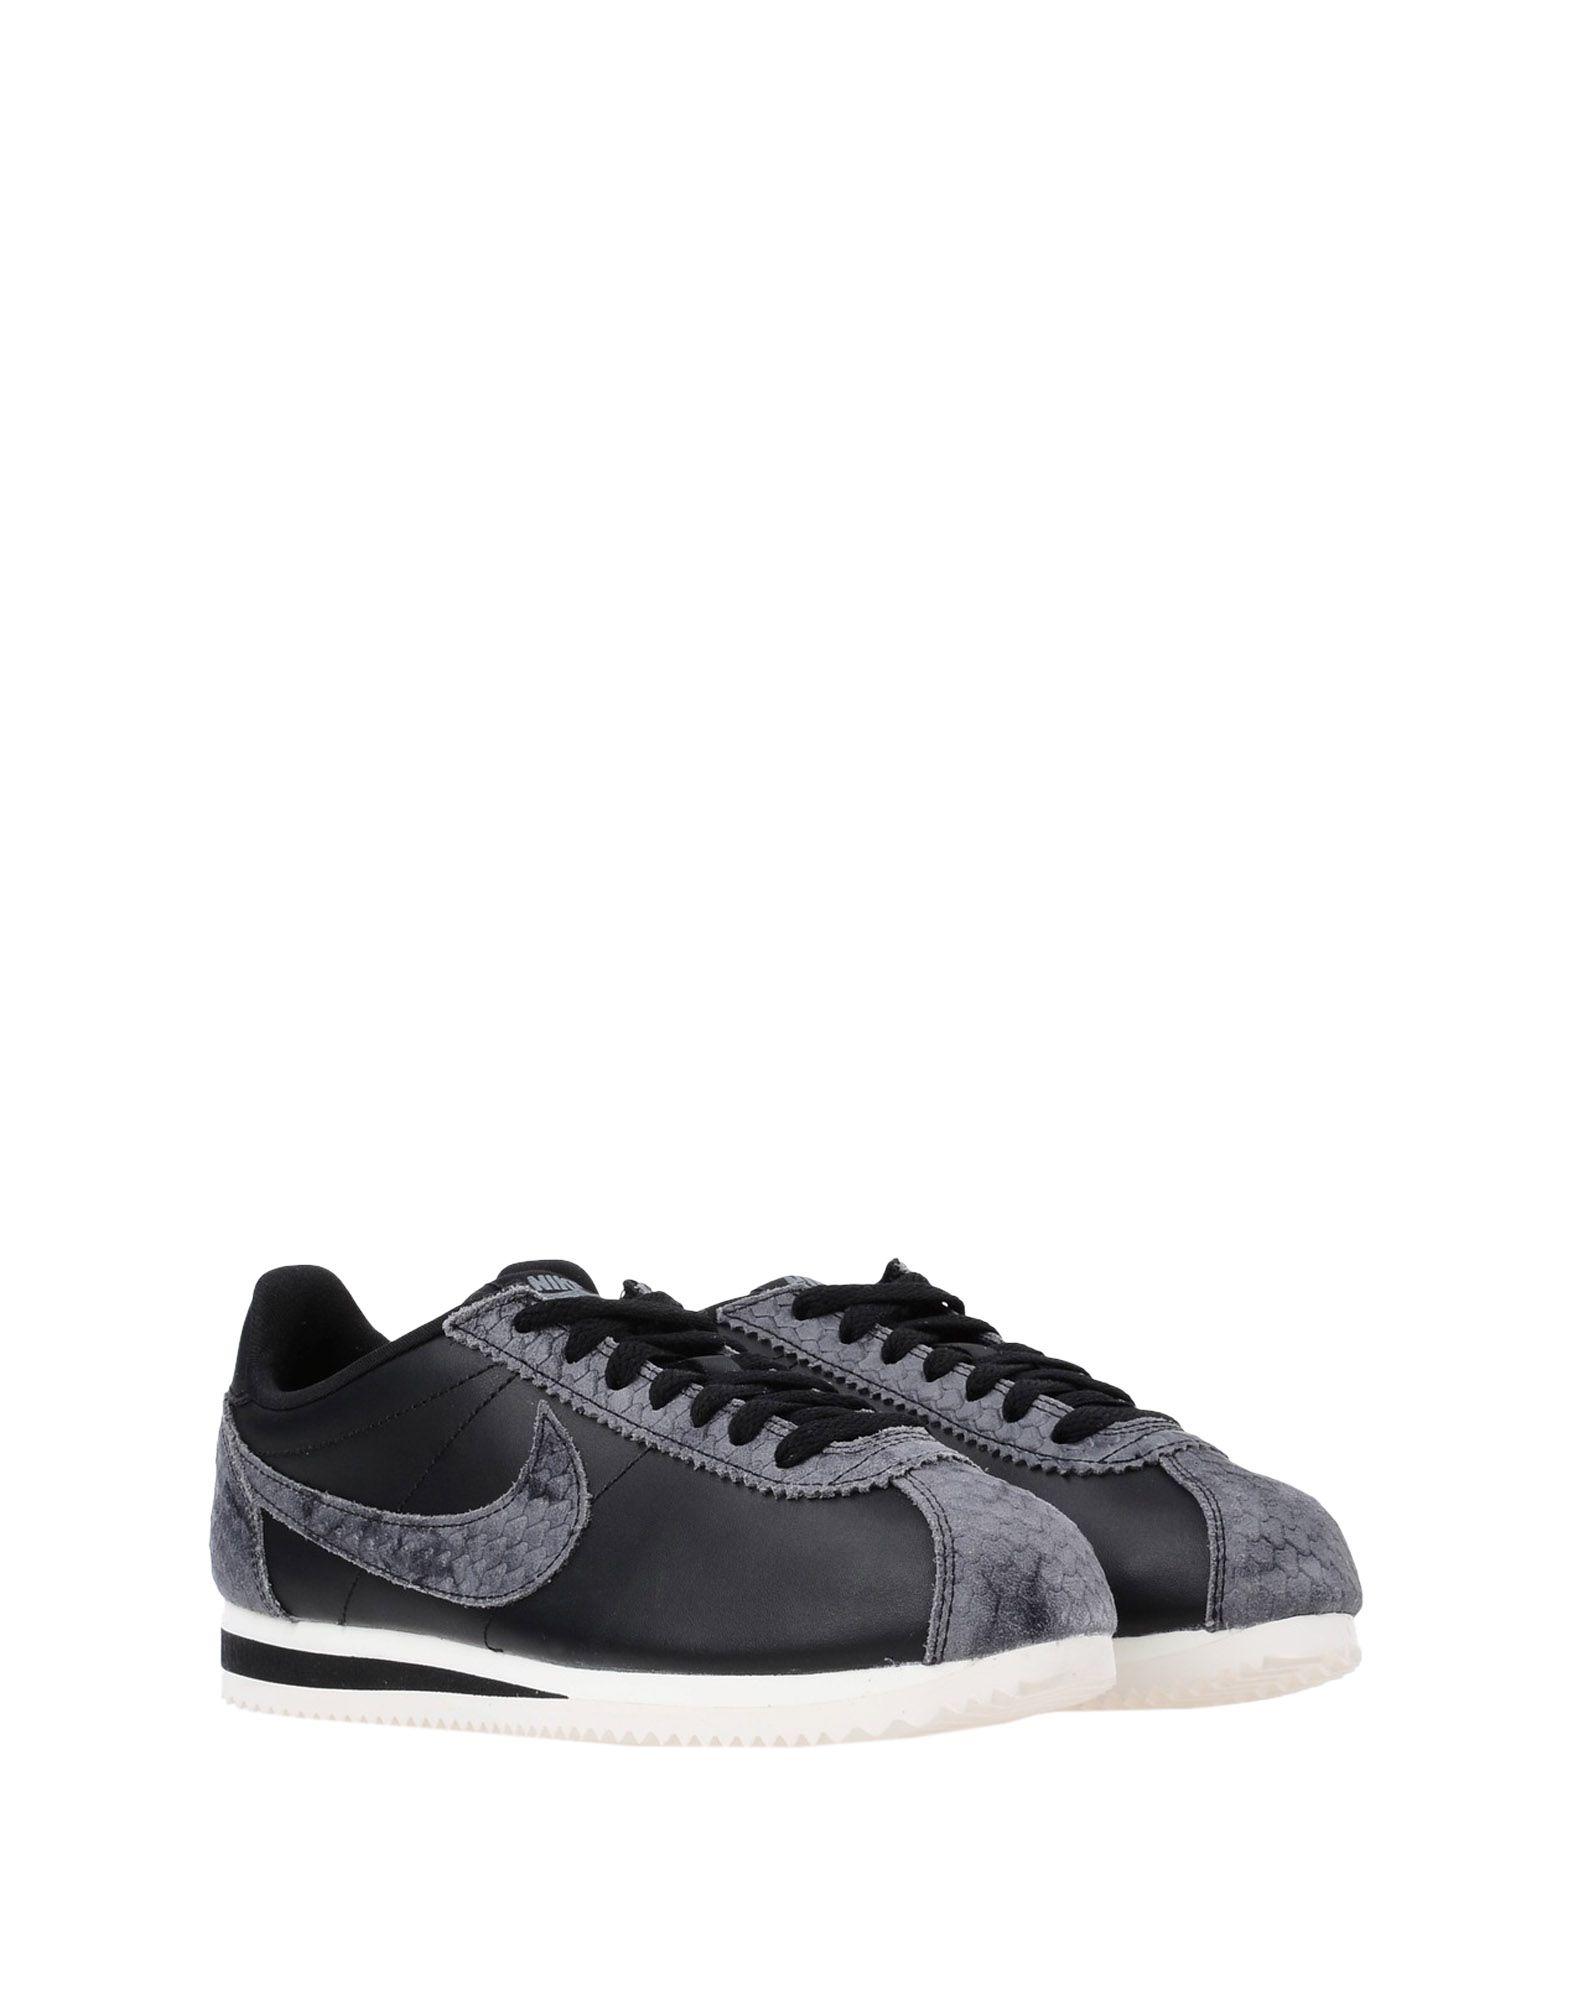 Nike Nike Nike  Classic Cortez Premium  11332915RR Gute Qualität beliebte Schuhe 162867